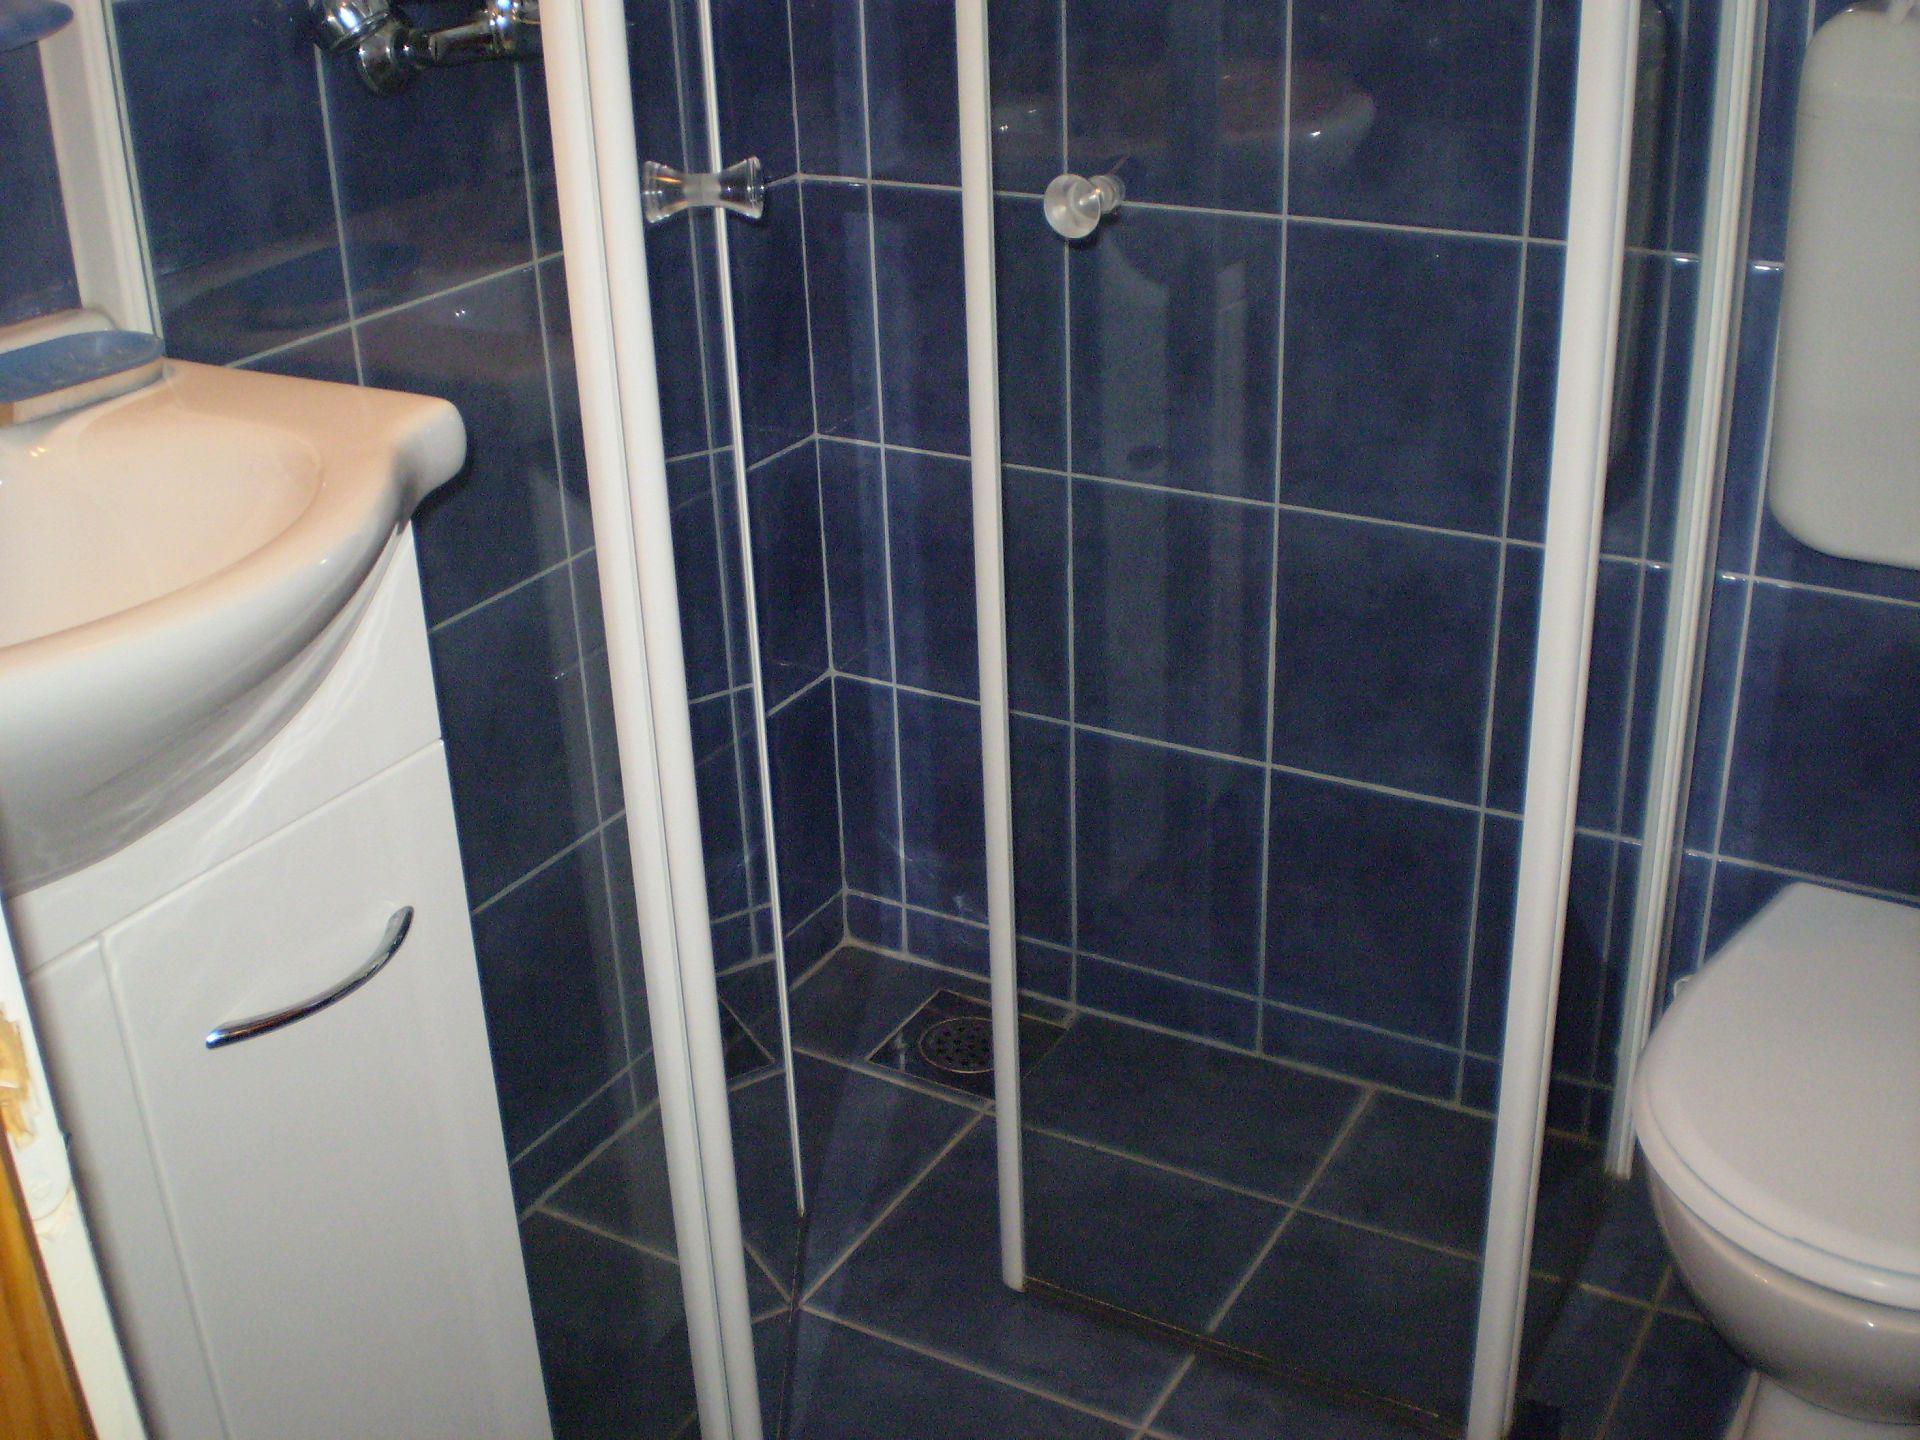 003SUCU  - Sucuraj - Appartementen Kroatië - SA13(3): badkamer met toilet